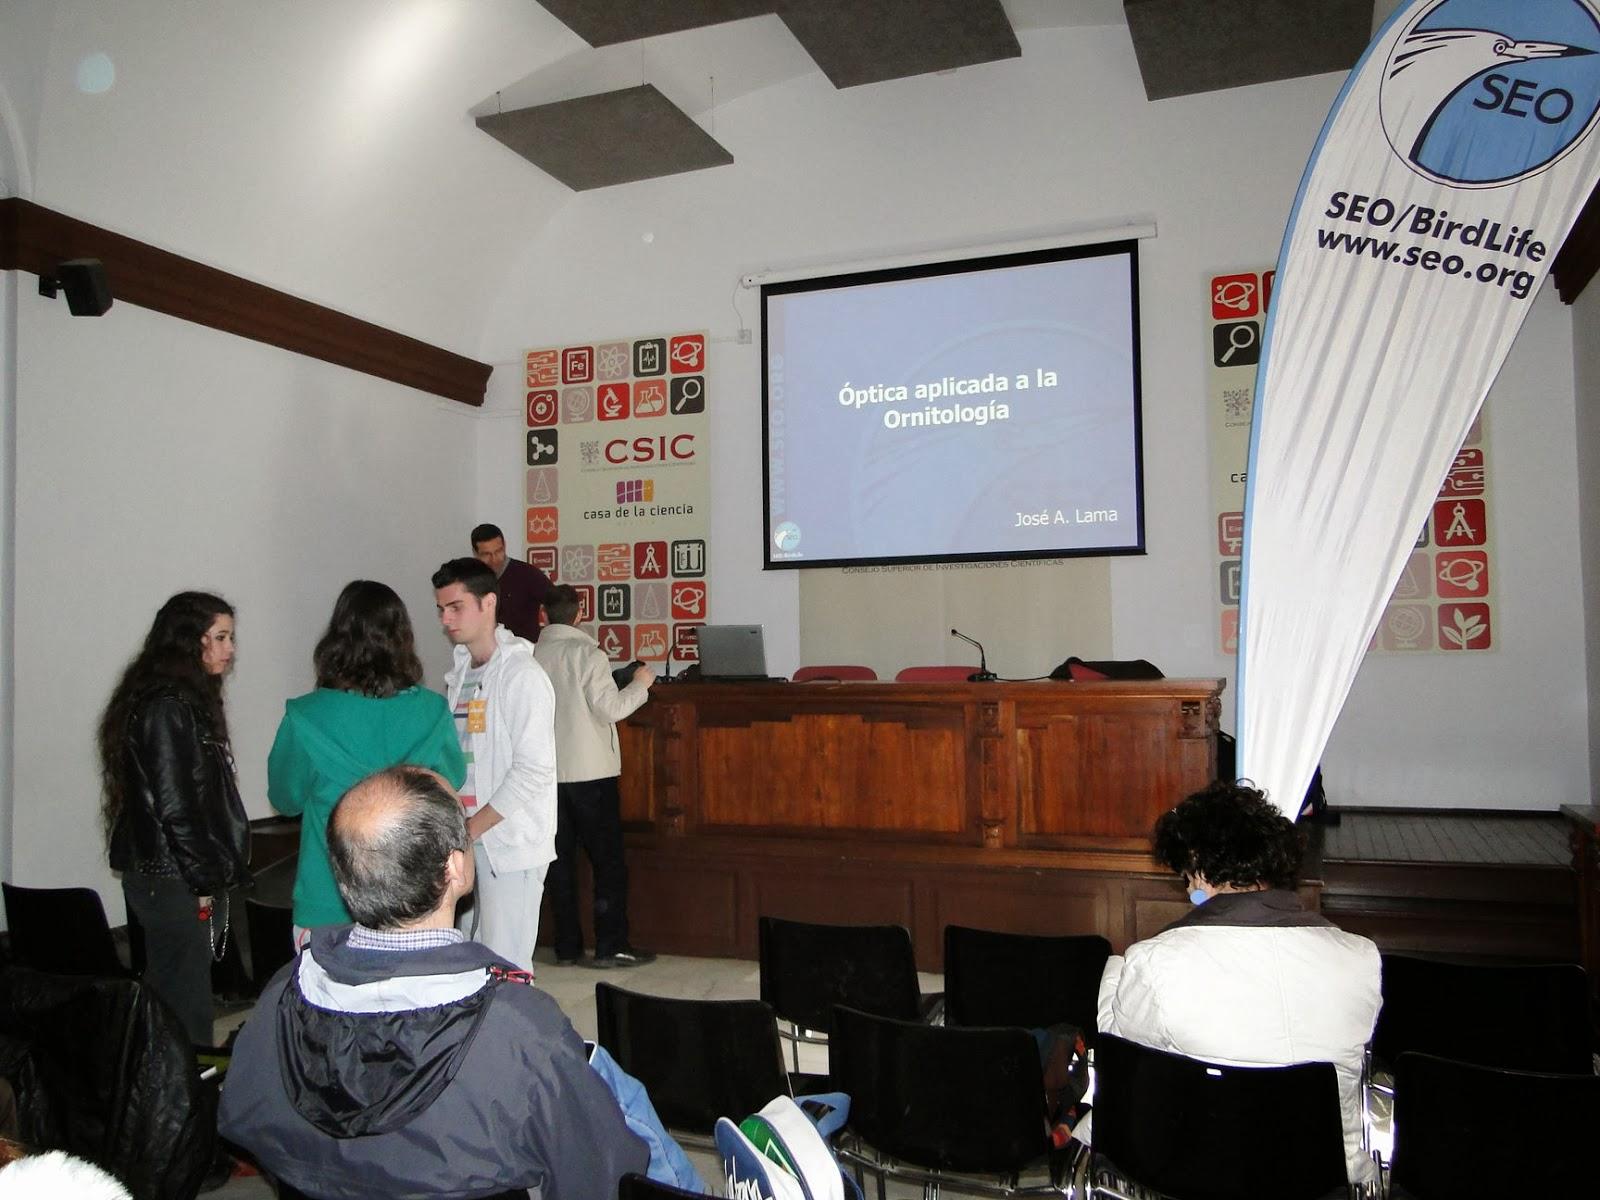 Curso de Iniciación a la Ornitología 2013. SEO-Sevilla